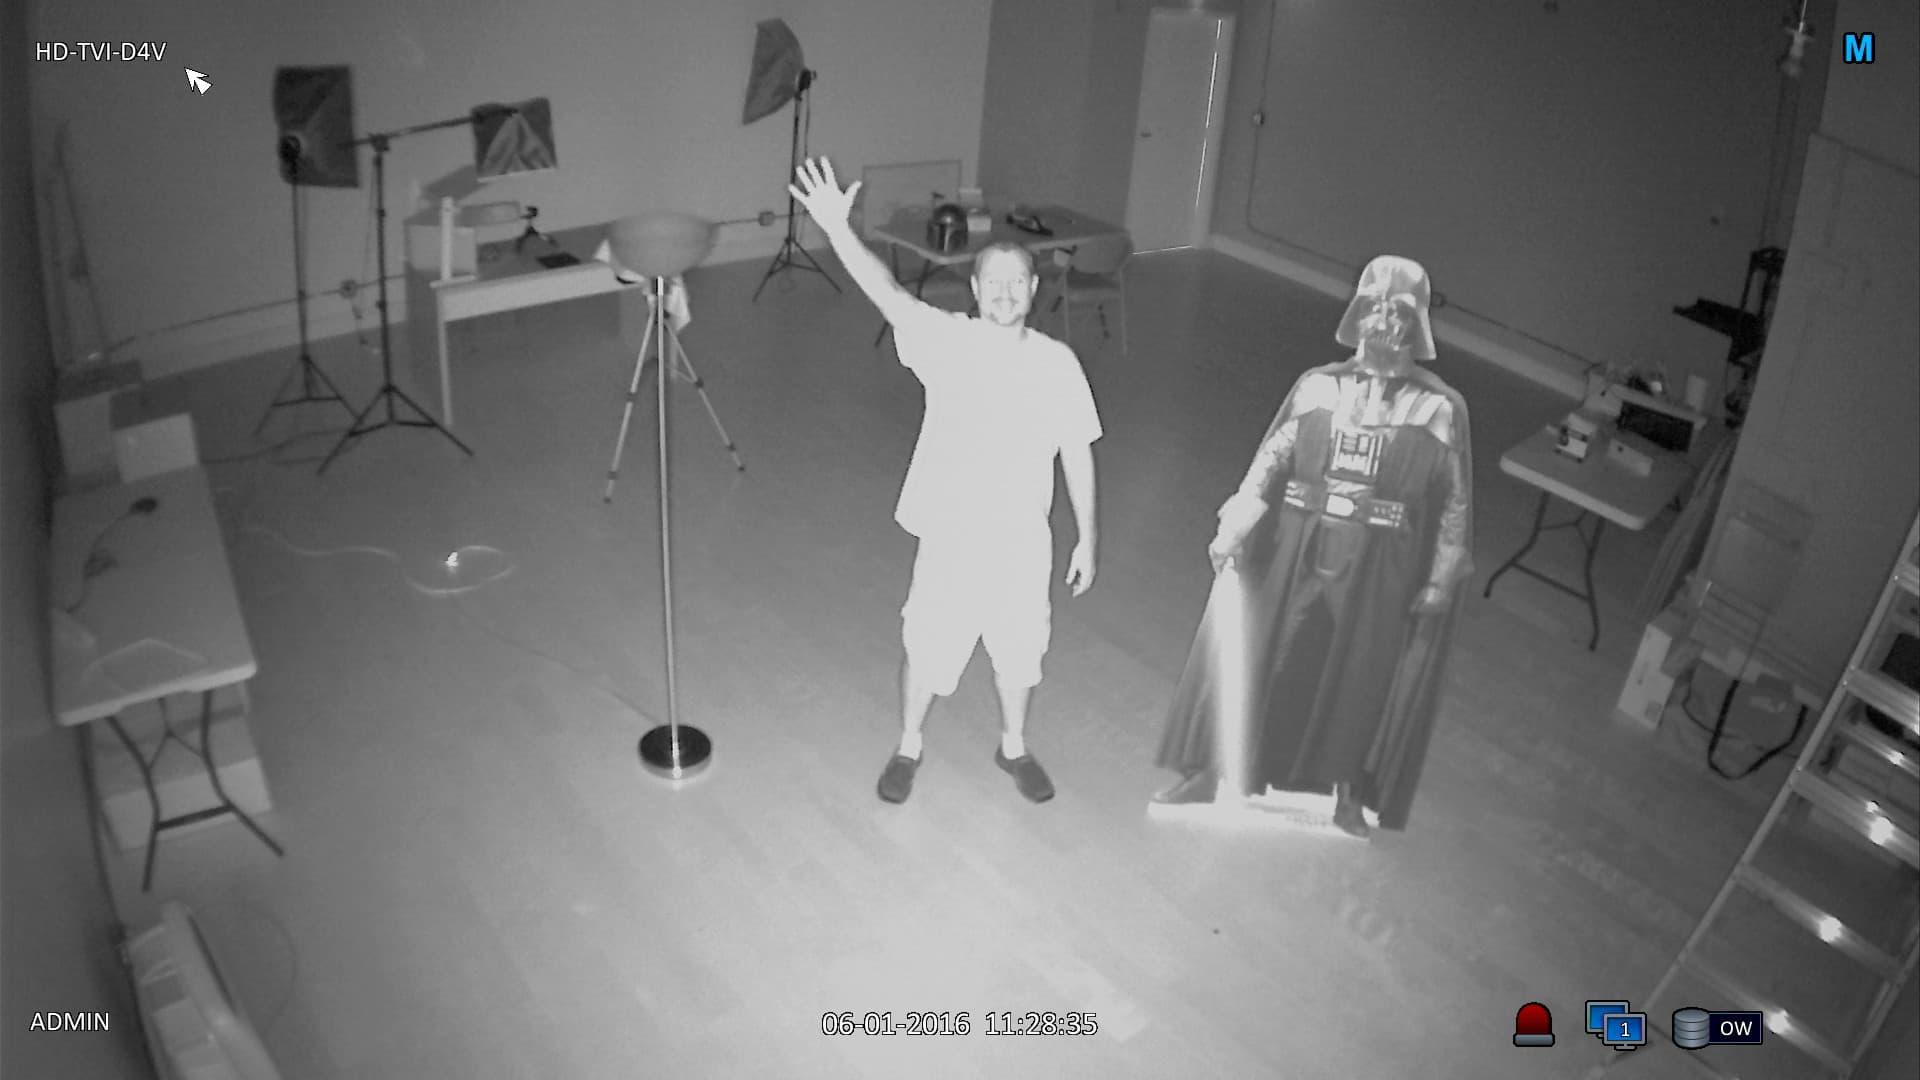 Indoor Dome Hd Tvi Camera 1080p Video Varifocal Lens Ir